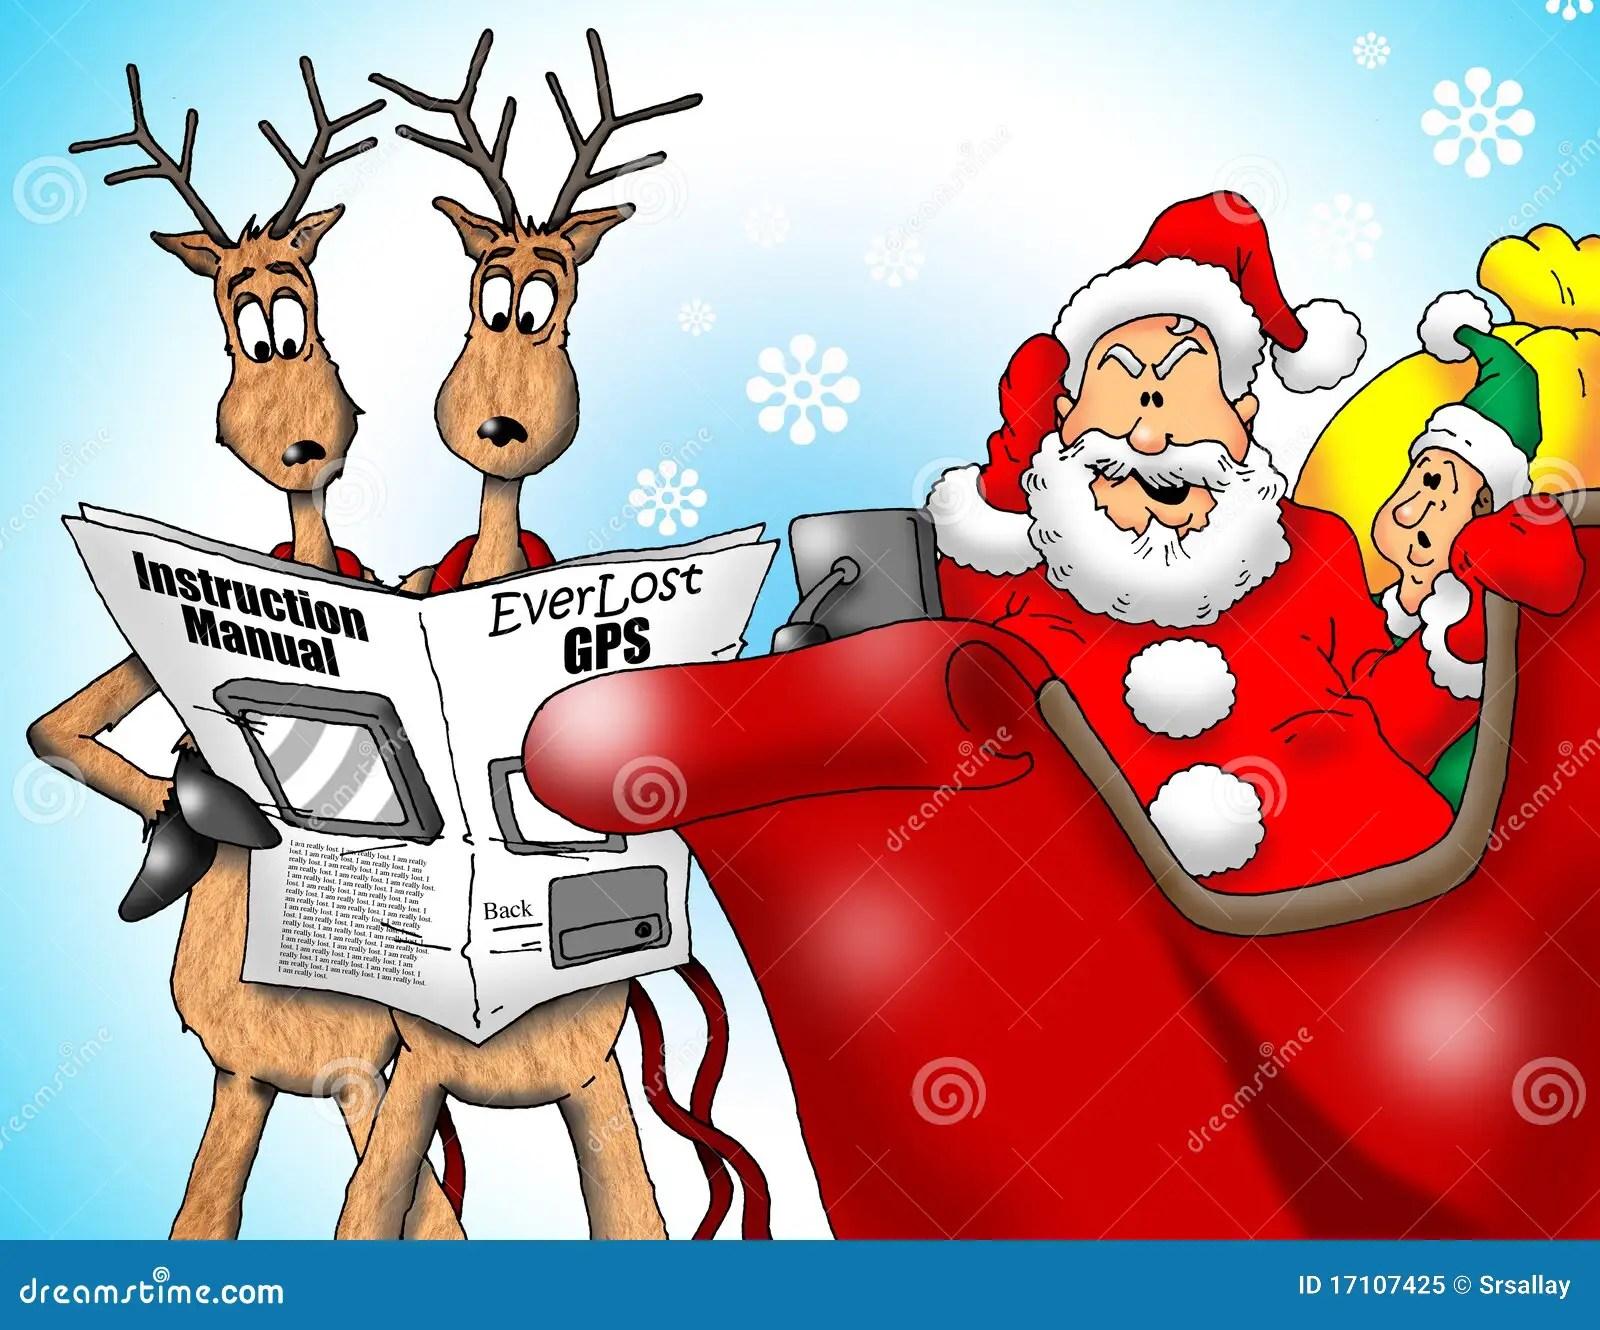 Lost Santa With GPS Royalty Free Stock Photo Image 17107425